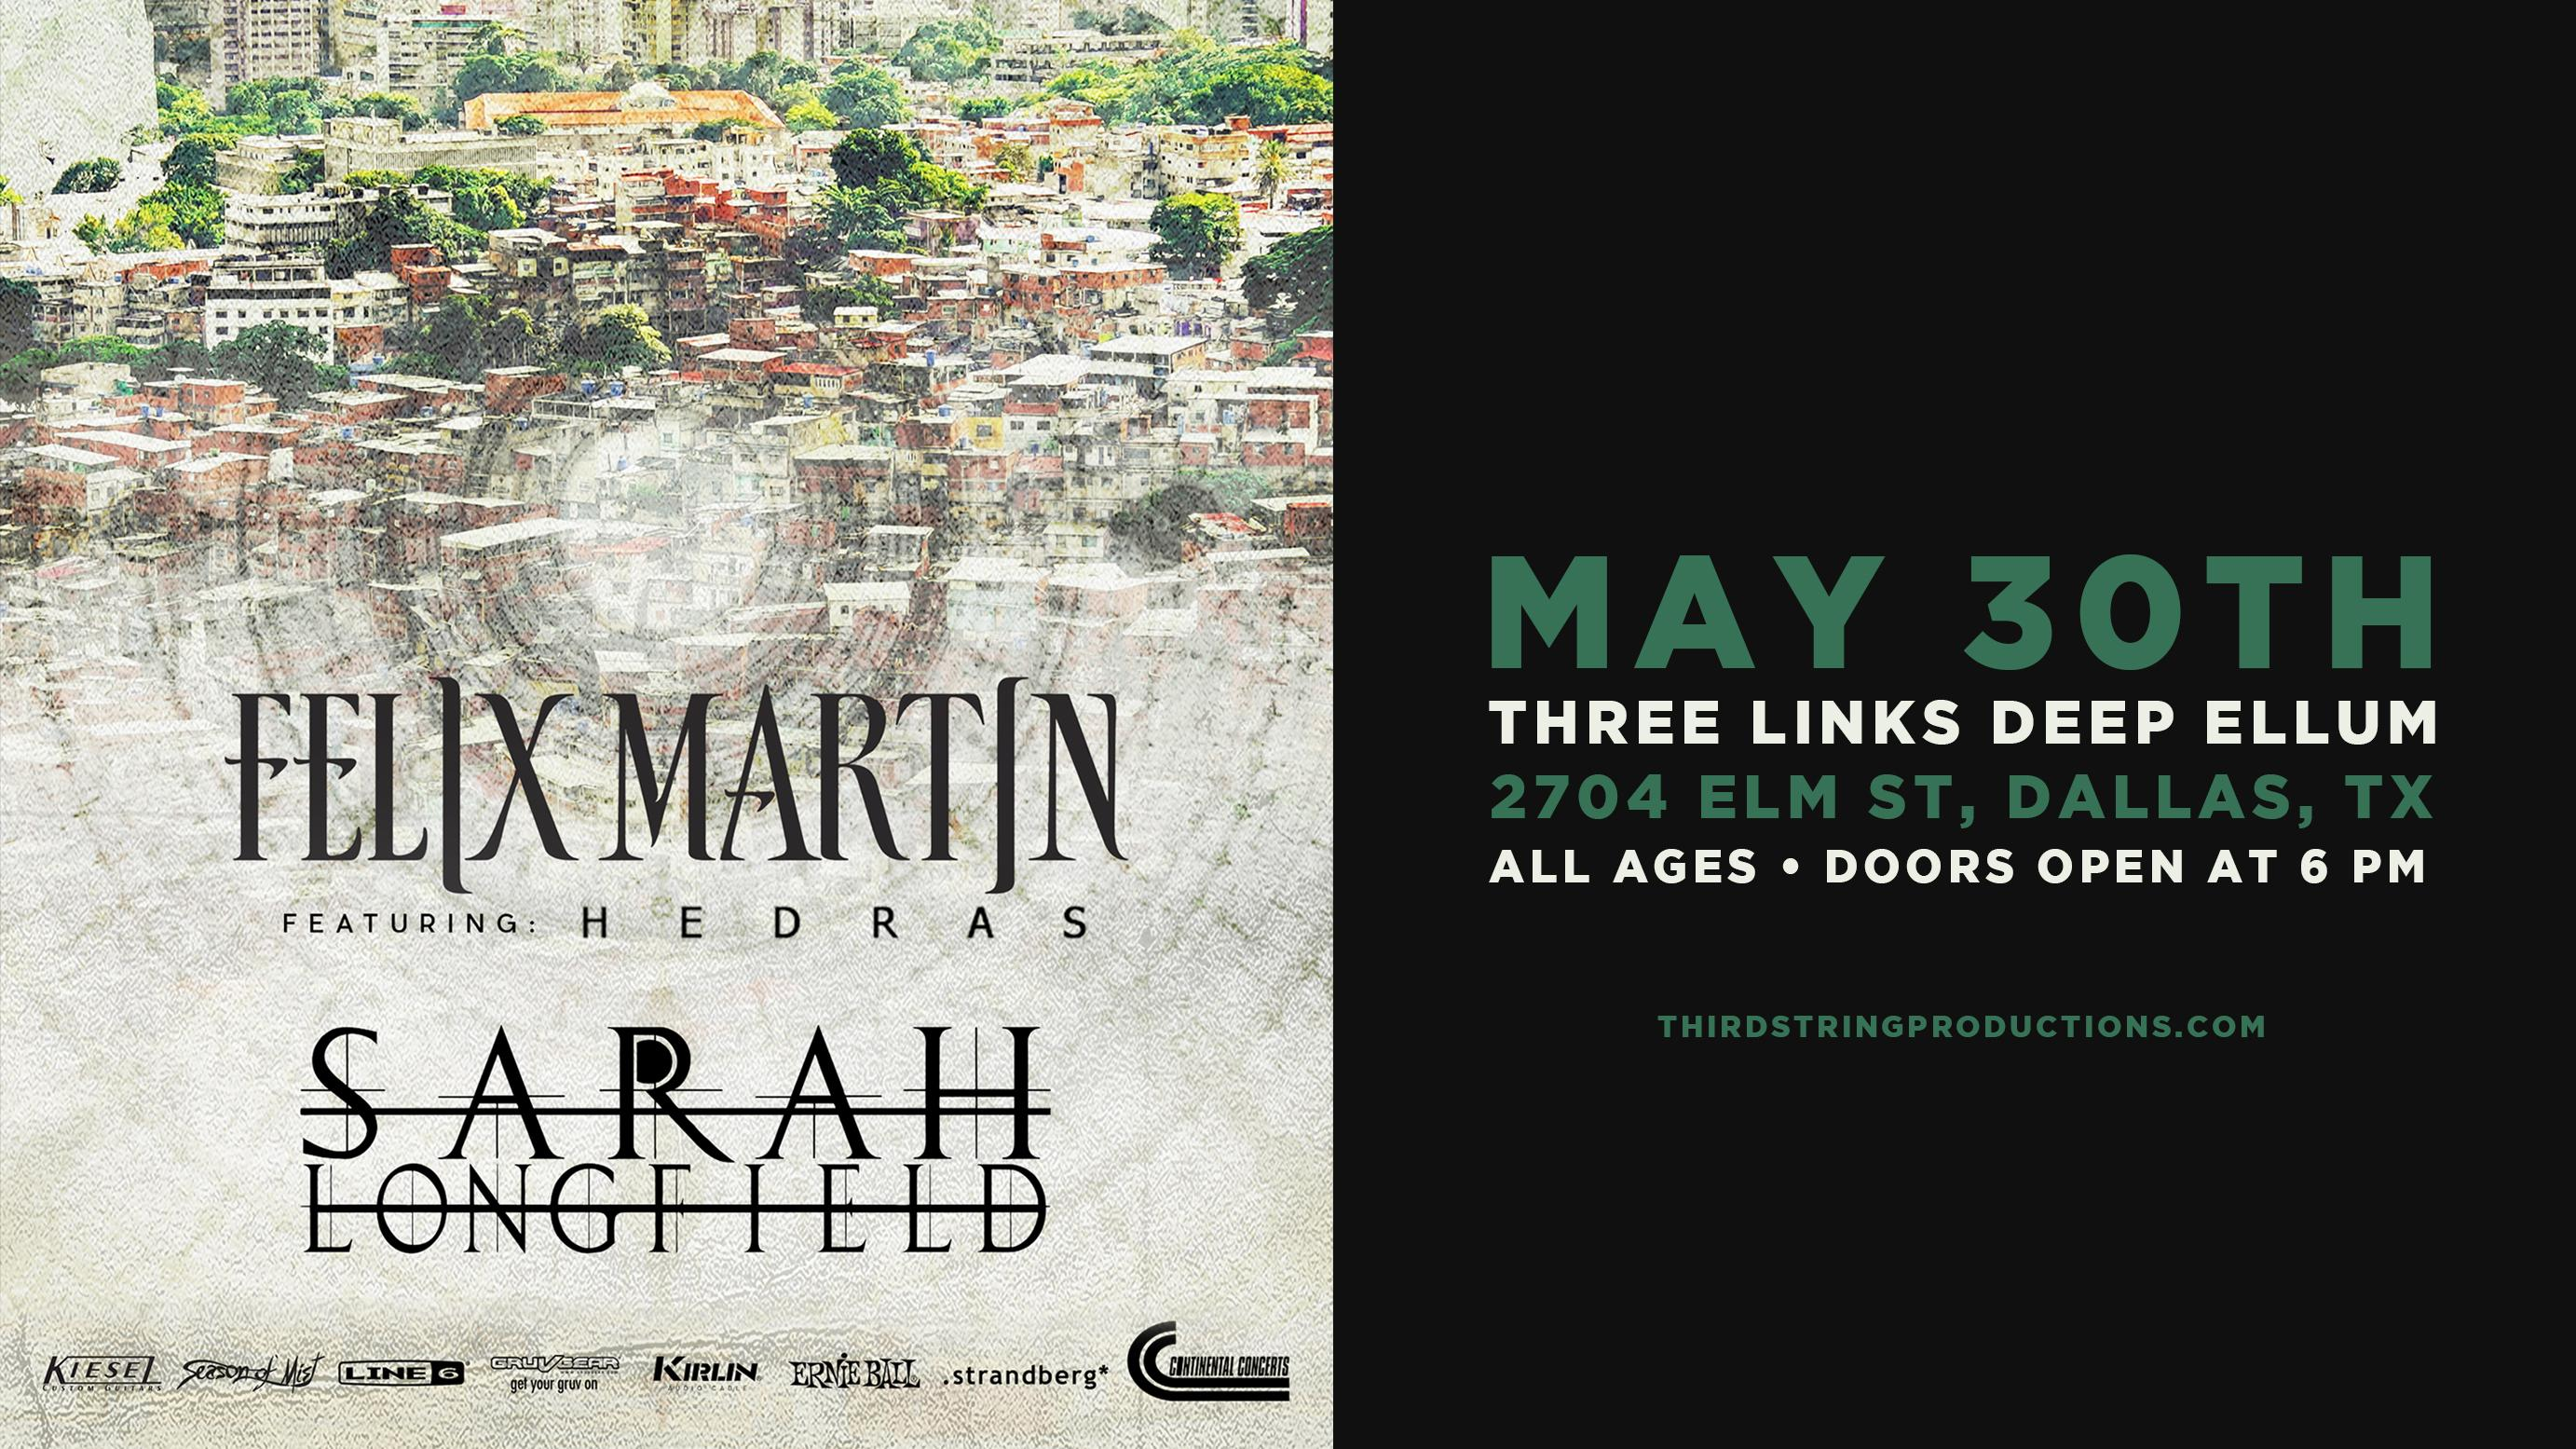 Felix Martin (Album Release Tour) with Sarah Longfield